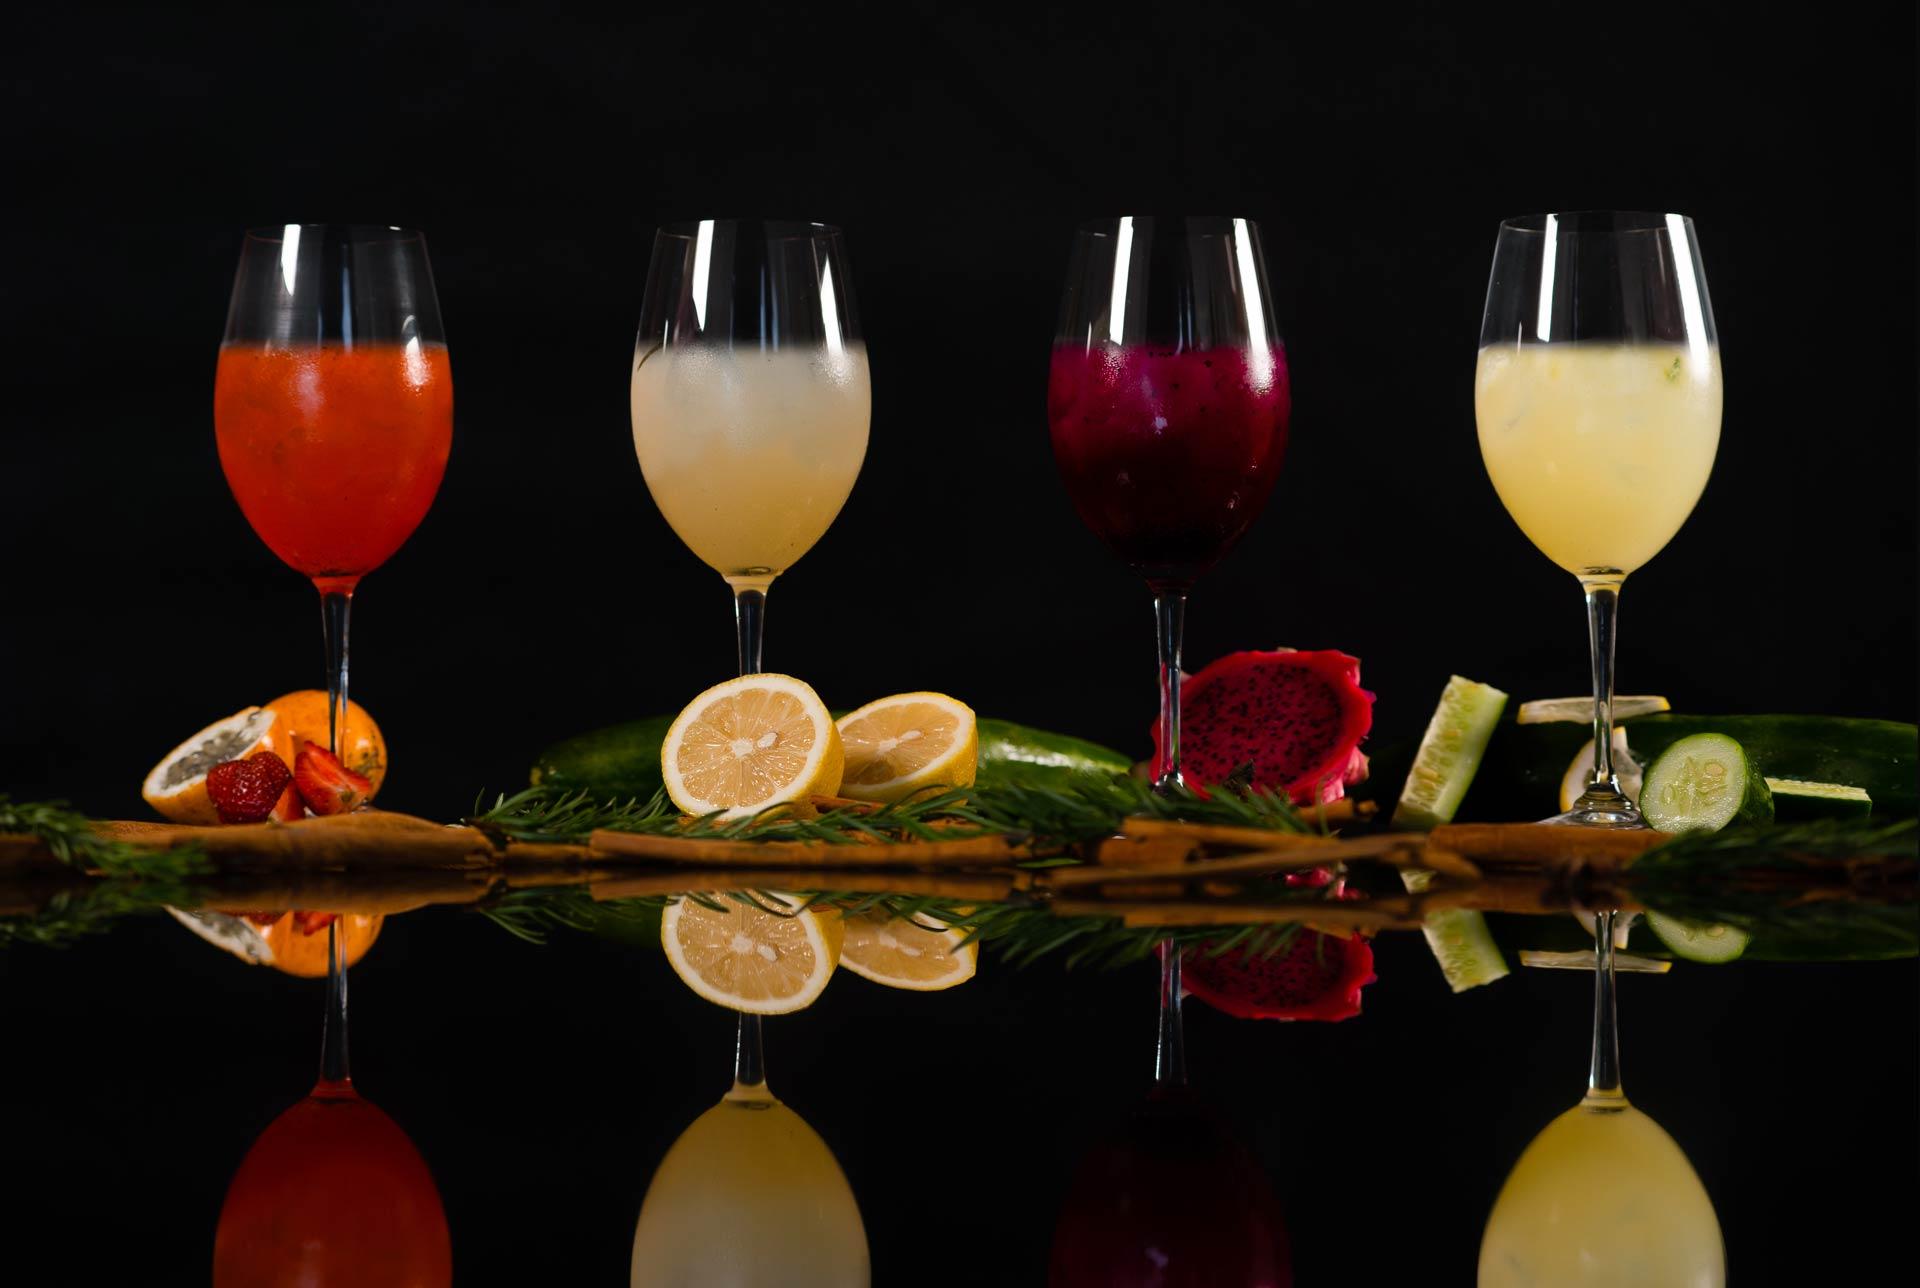 Lemon Squash Beverage Photography